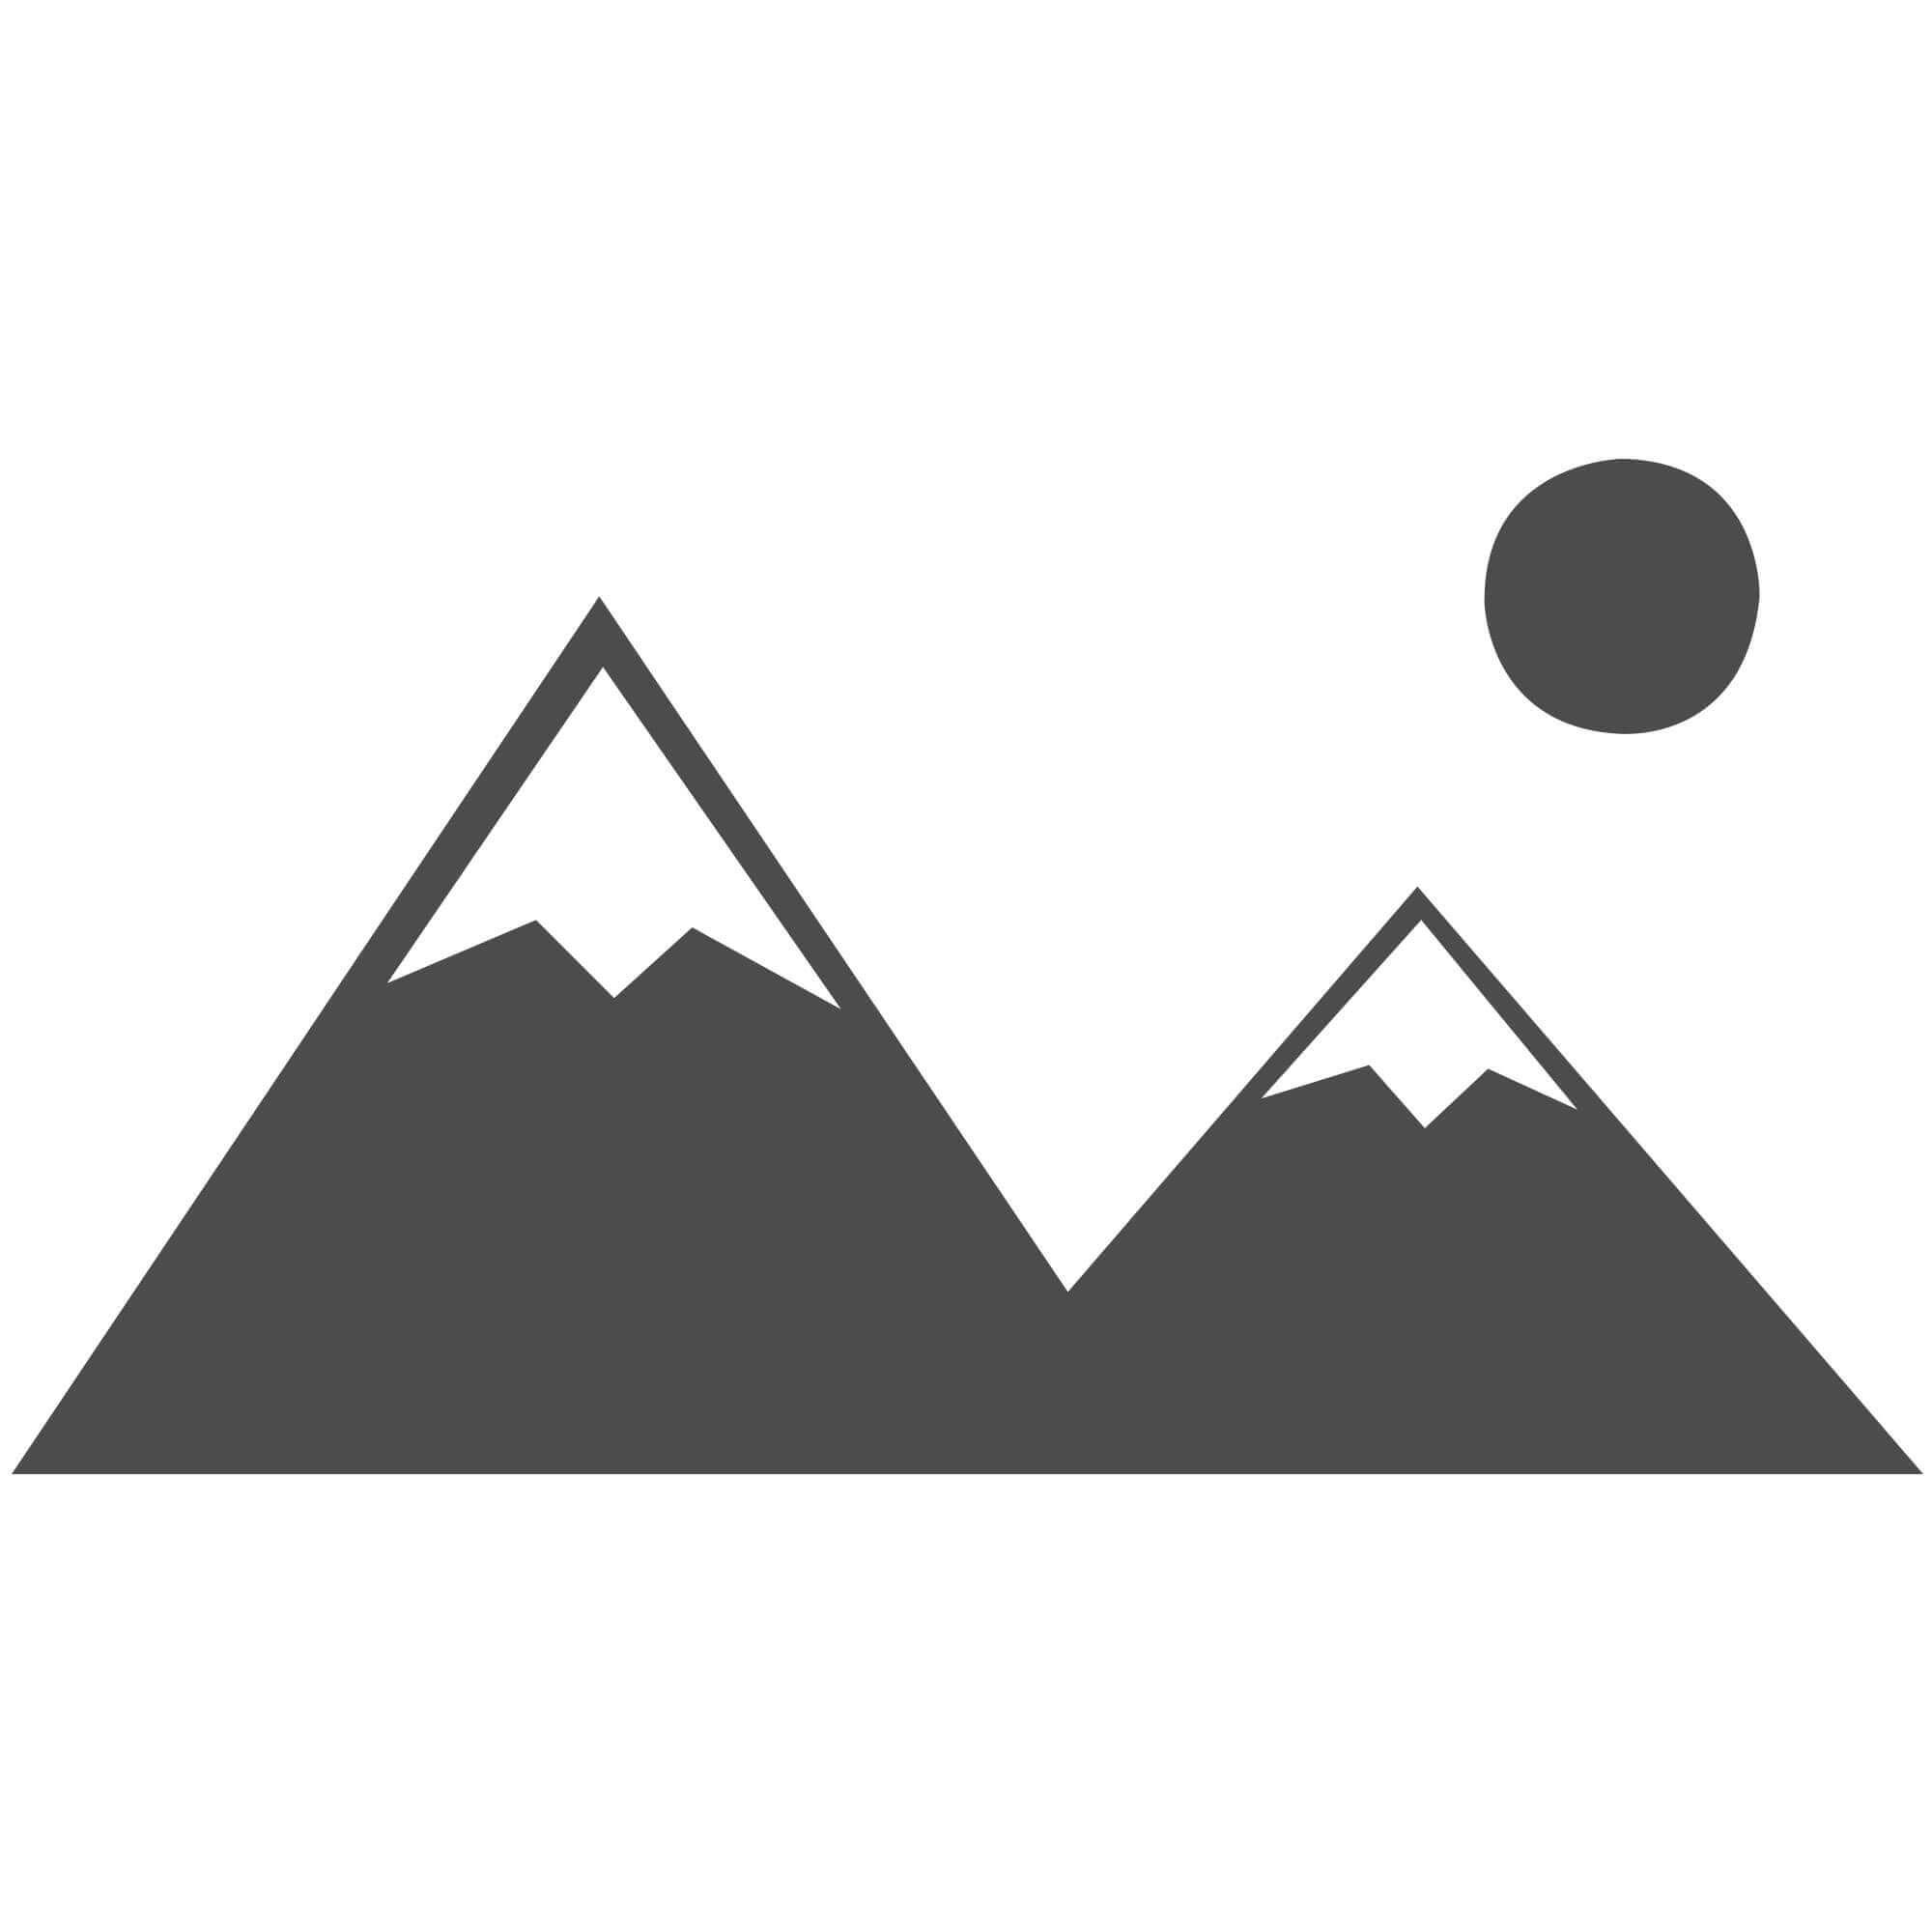 "Verge Ombre Rug - Grey - Size 120 x 170 cm (4' x 5'7"")"